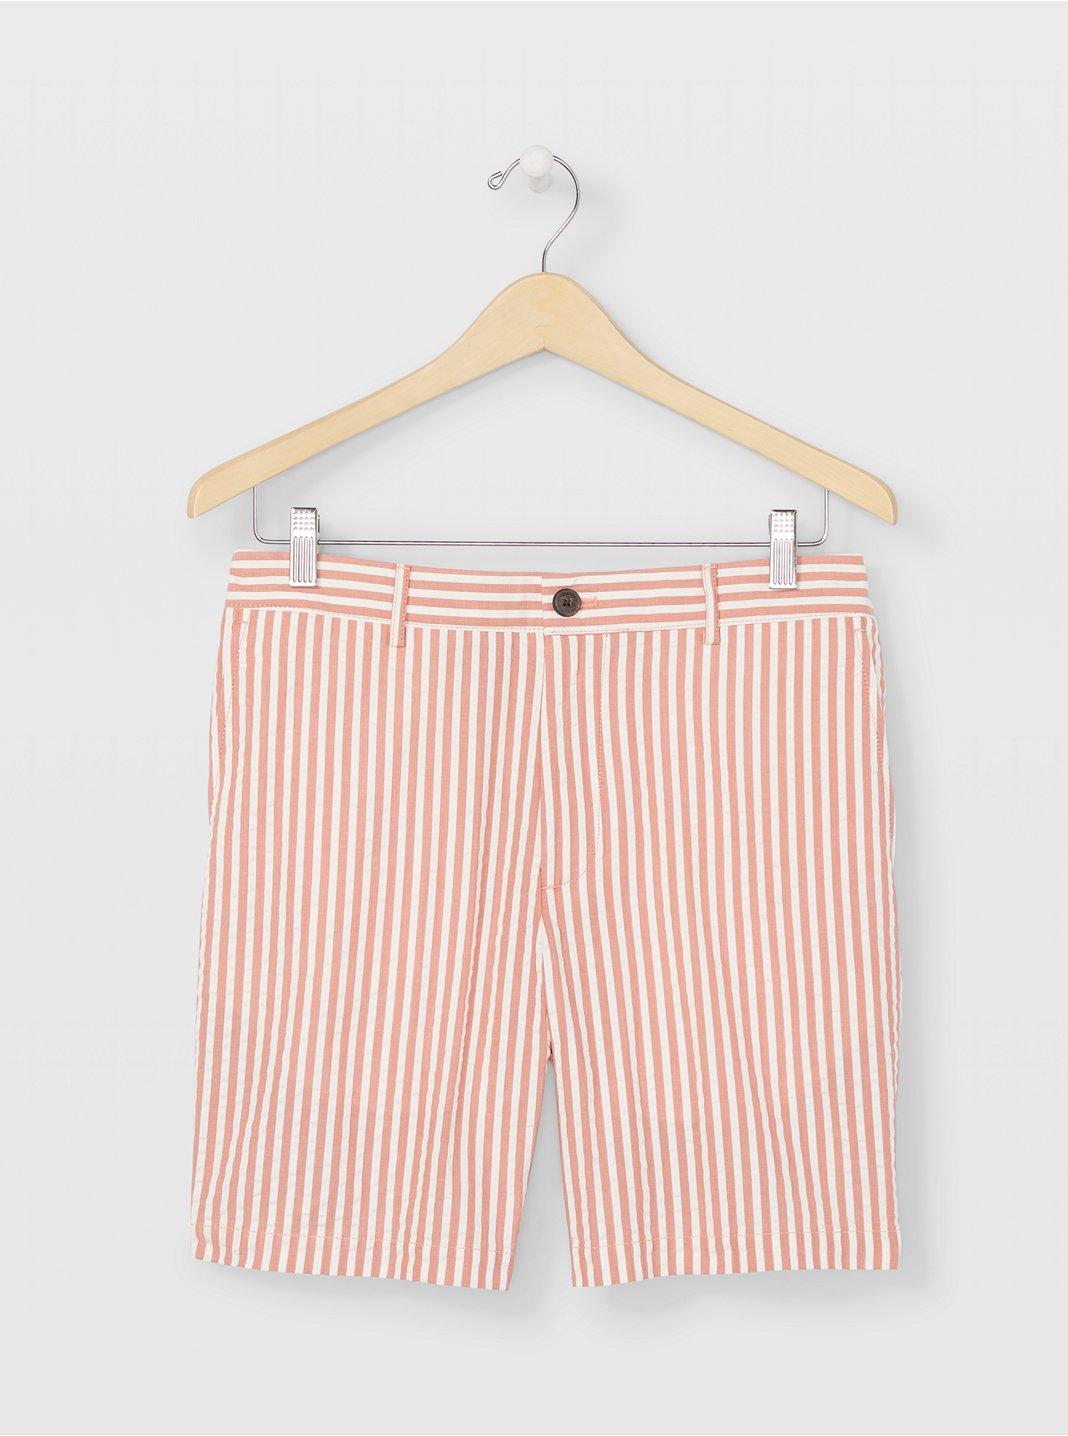 Baxter Seersucker Shorts